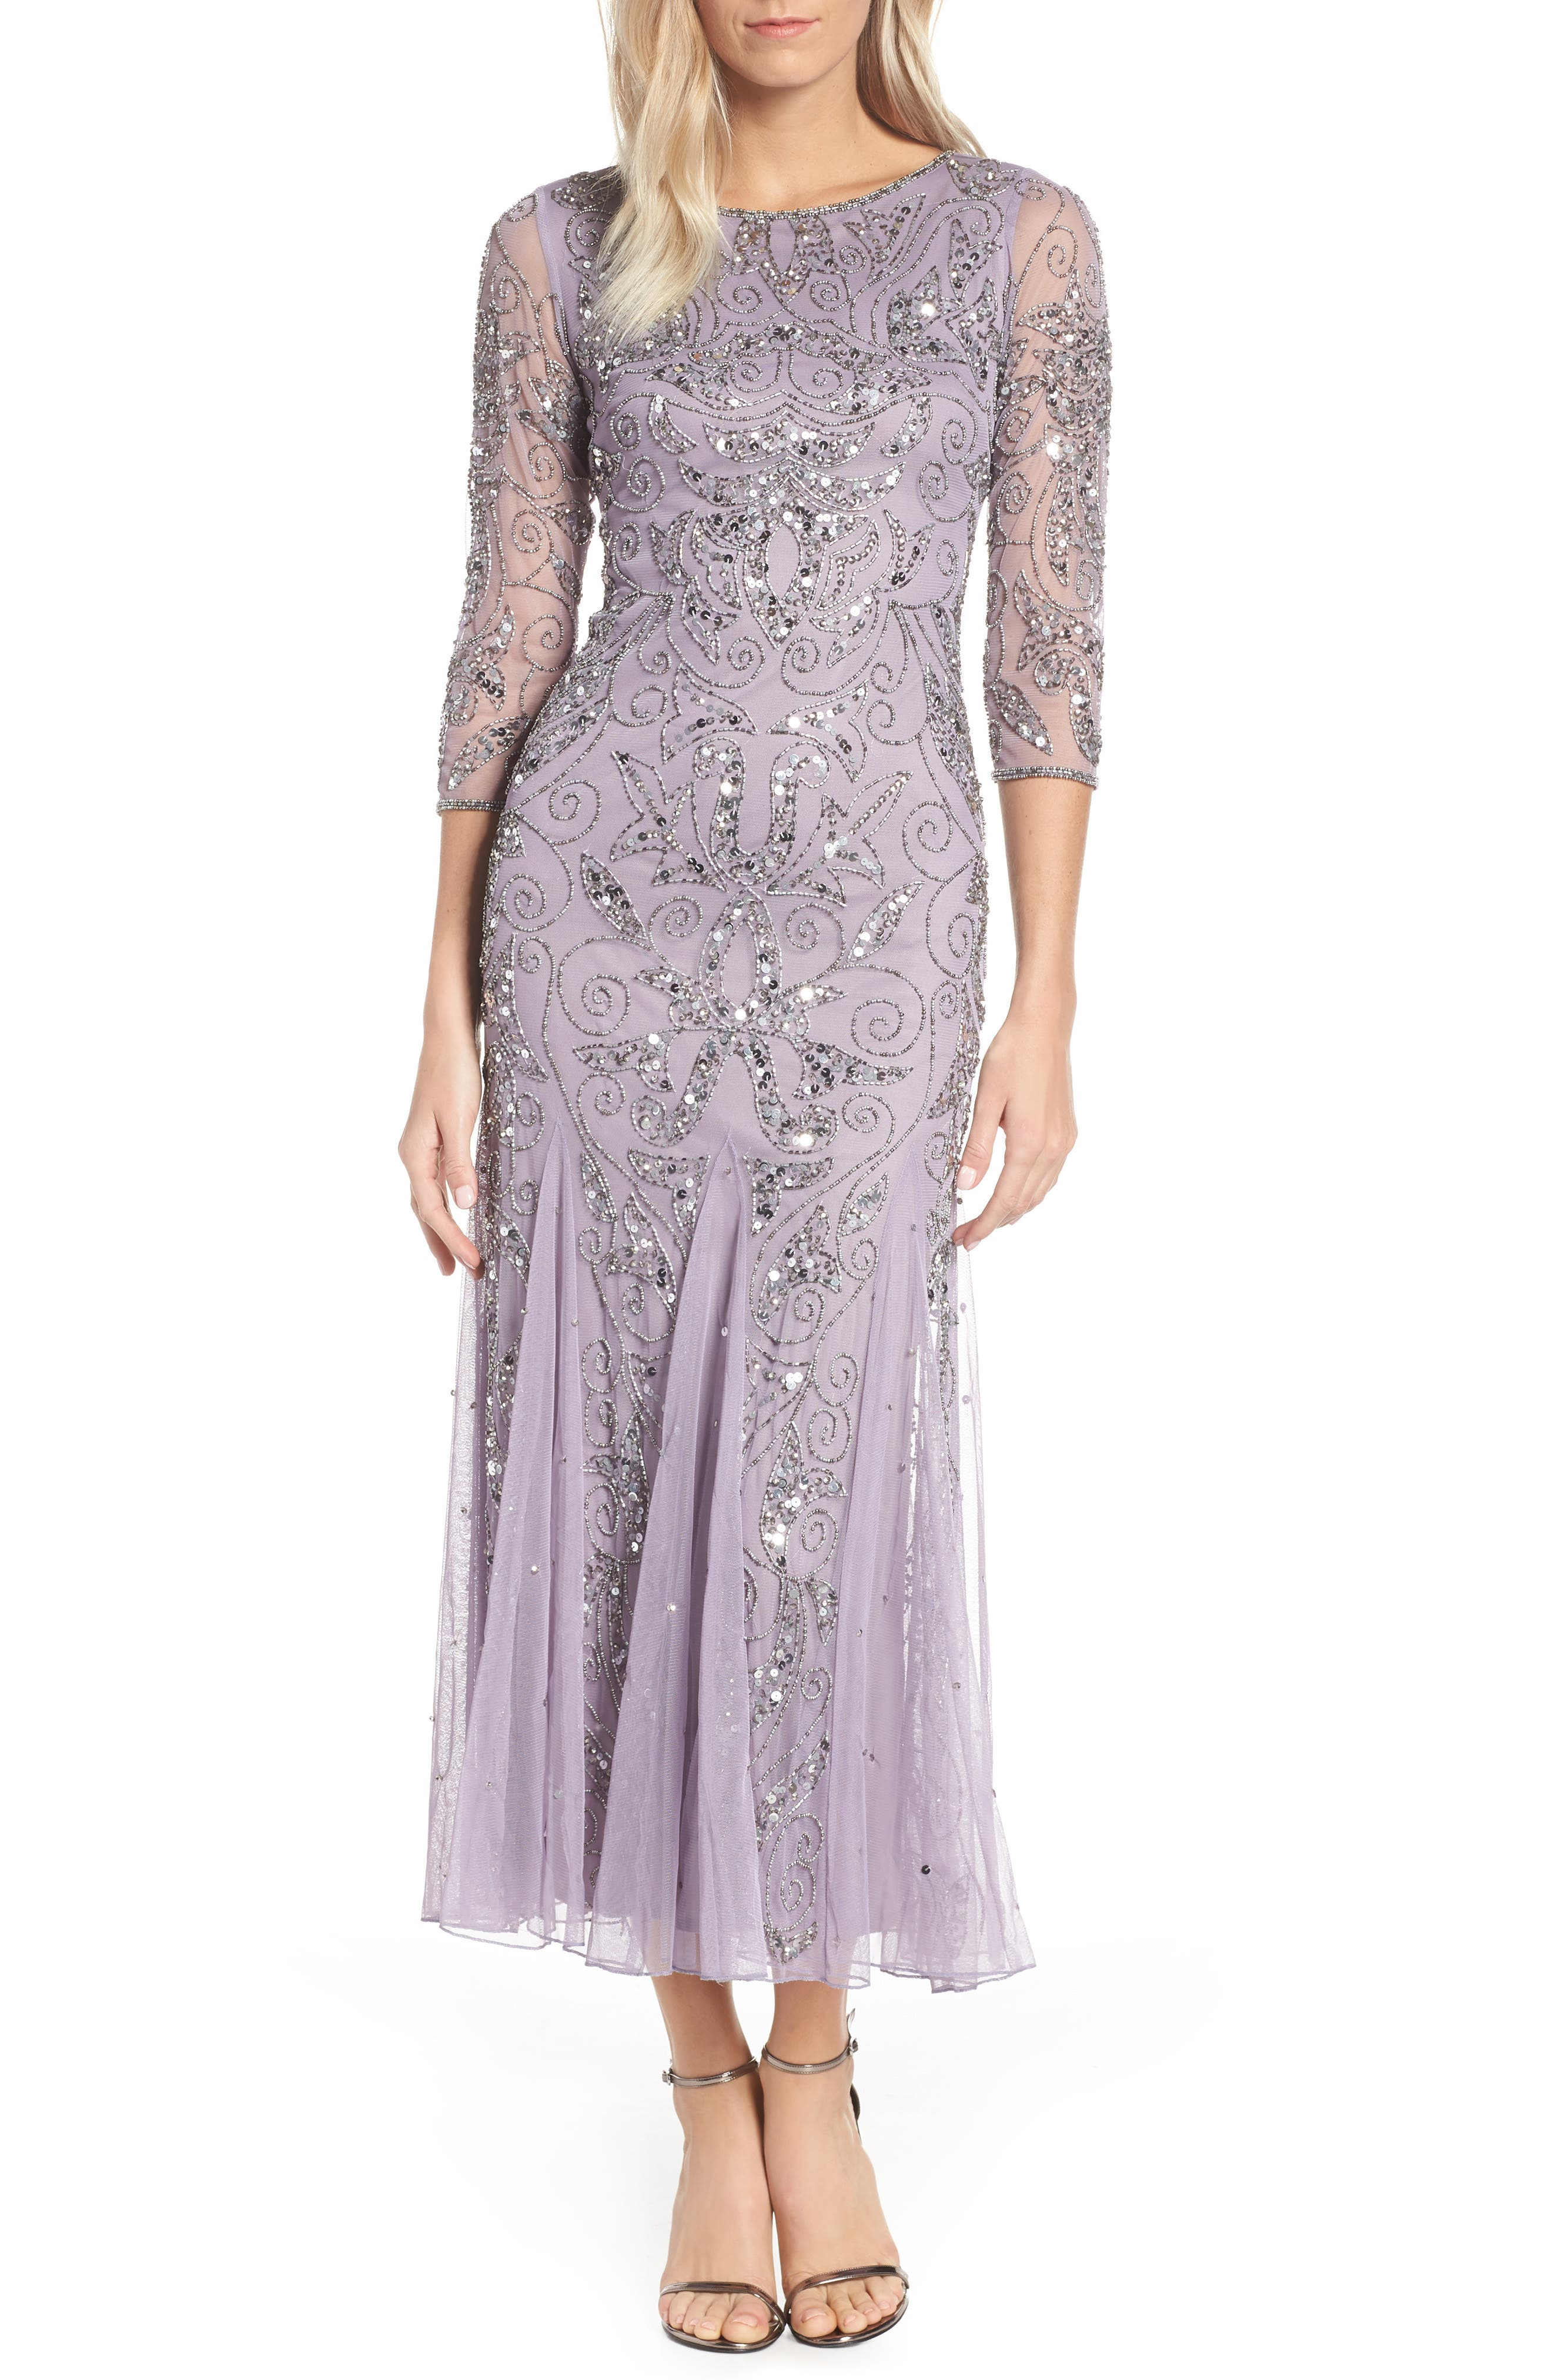 1920s Style Dresses, 20s Dresses Womens Pisarro Nights Embellished Mesh Gown Size 2 - Purple $218.00 AT vintagedancer.com